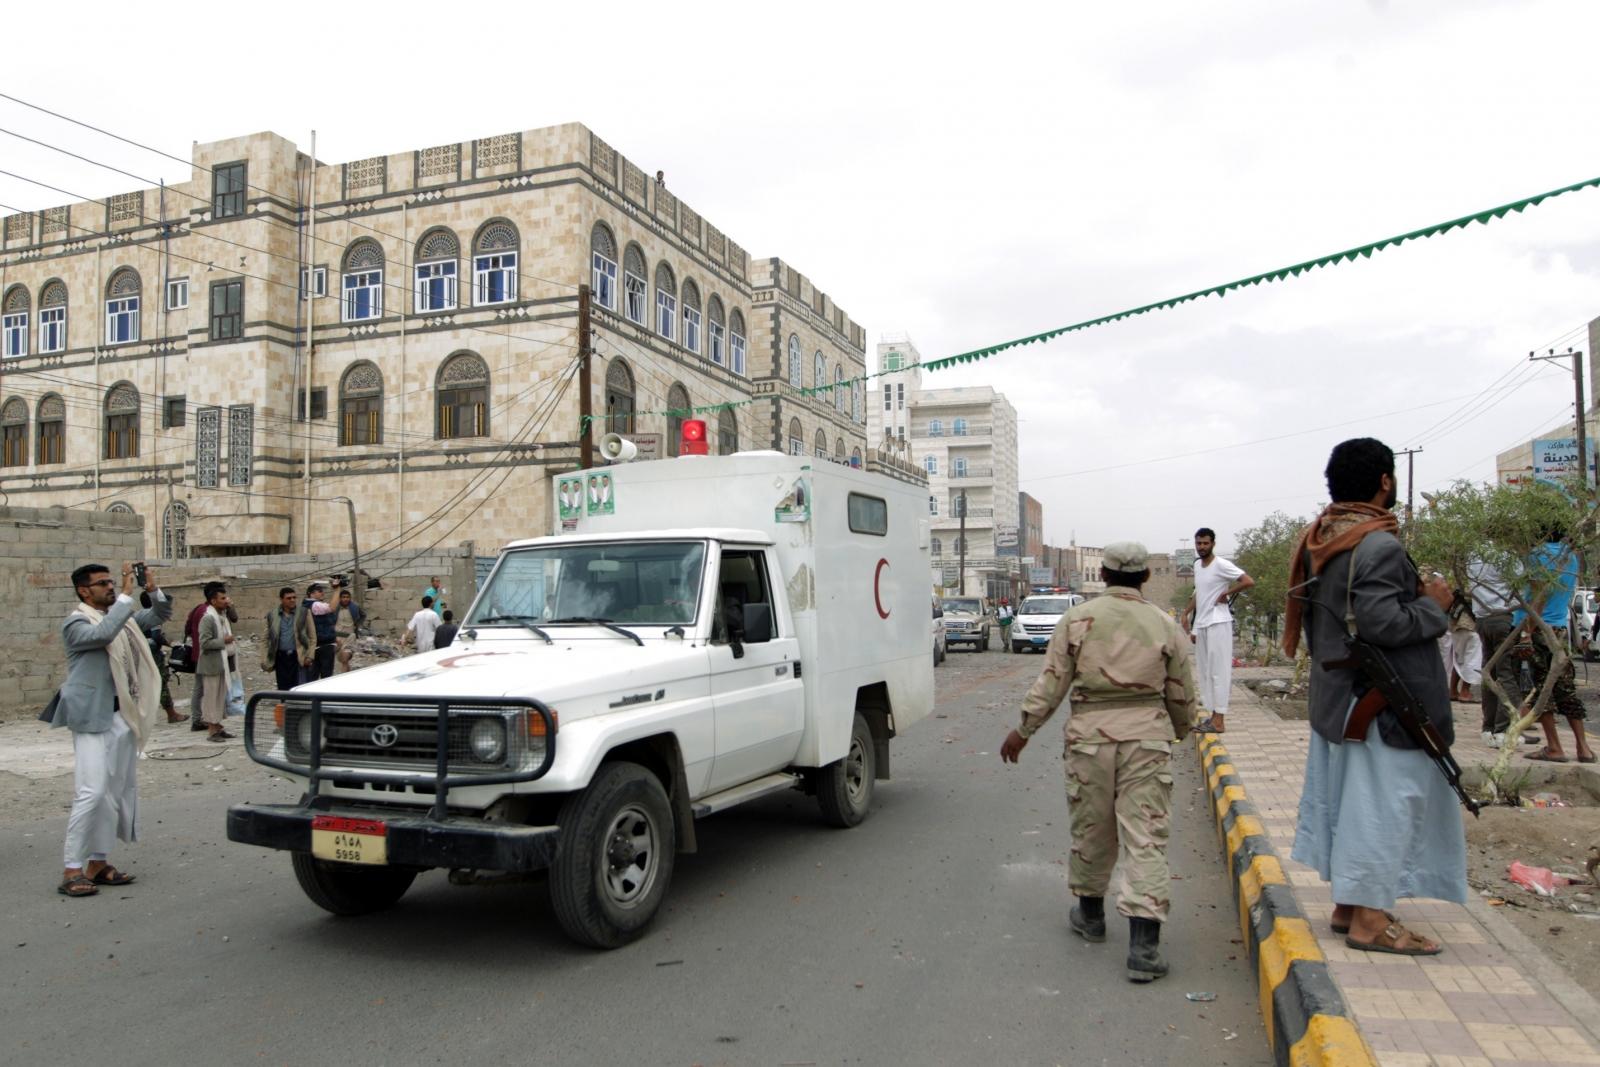 Yemen conflict Houthi rebels red crescent